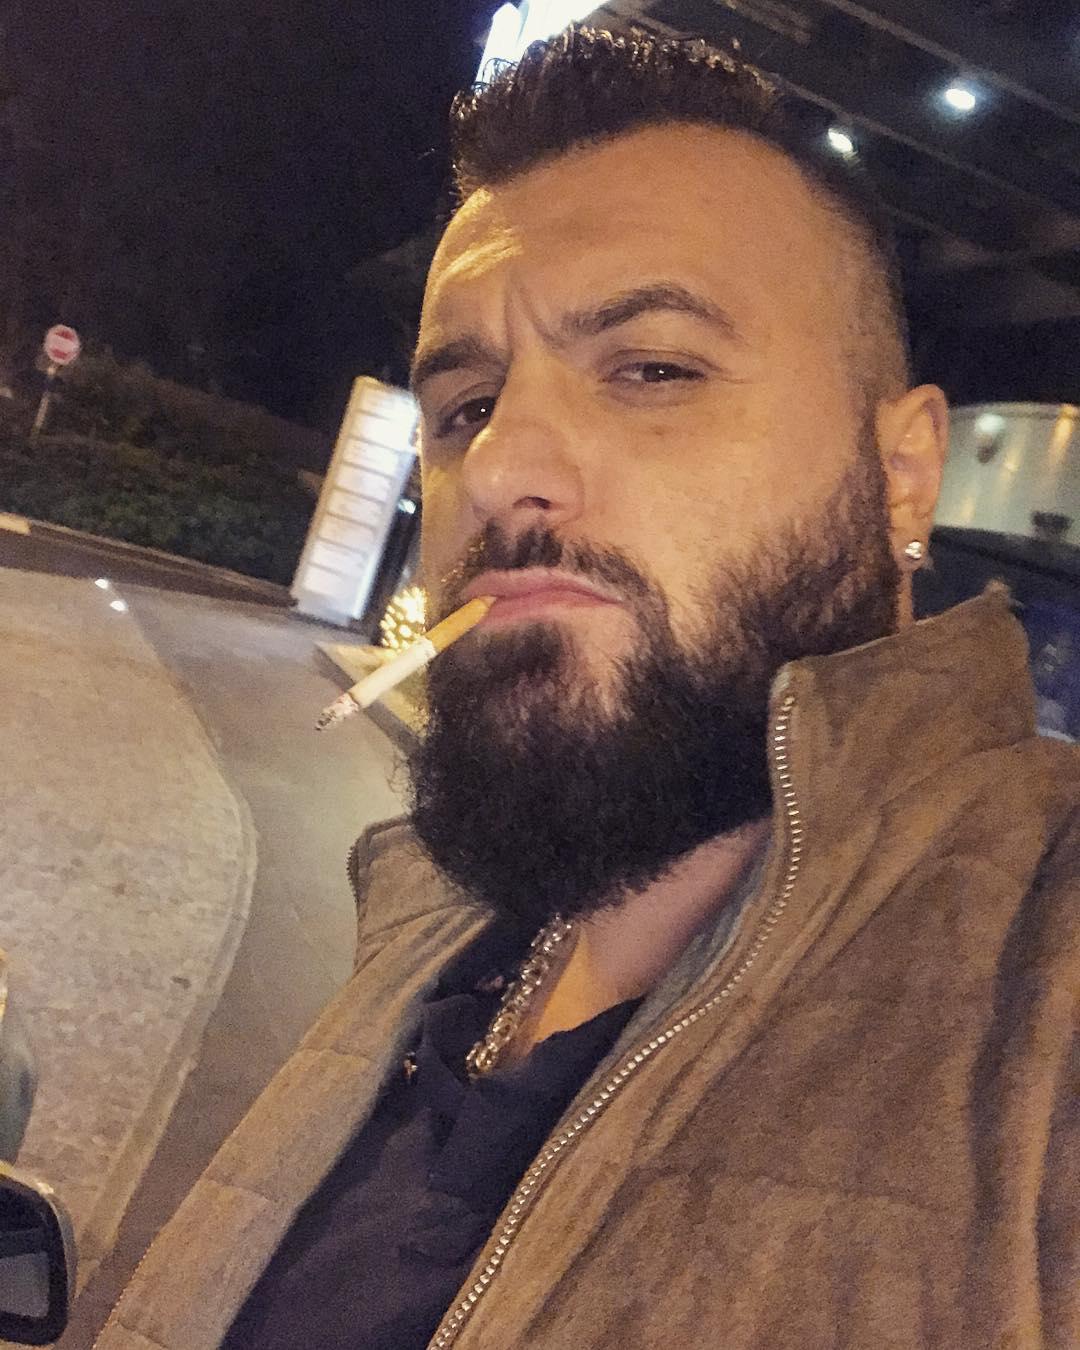 SKANDALOZAN SNIMAK ZAPALIO INTERNET: Buba Koreli zgranuo, pokazao kako TUKU MOMKA NASRED ULICE! (VIDEO)